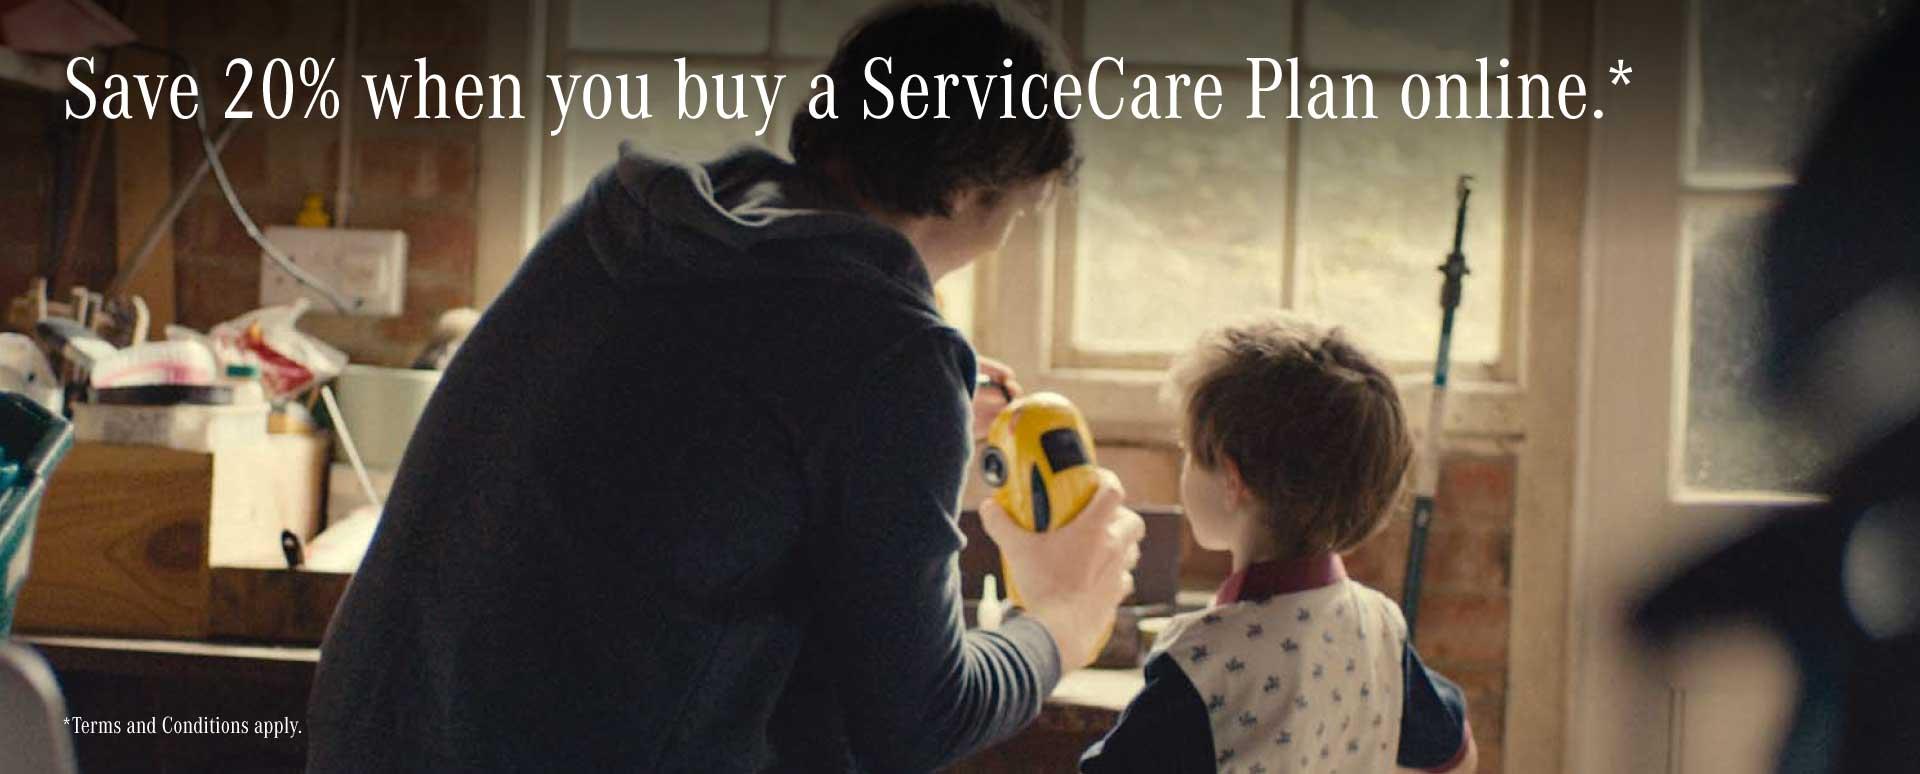 Mercedes-Benz Service Care Plan